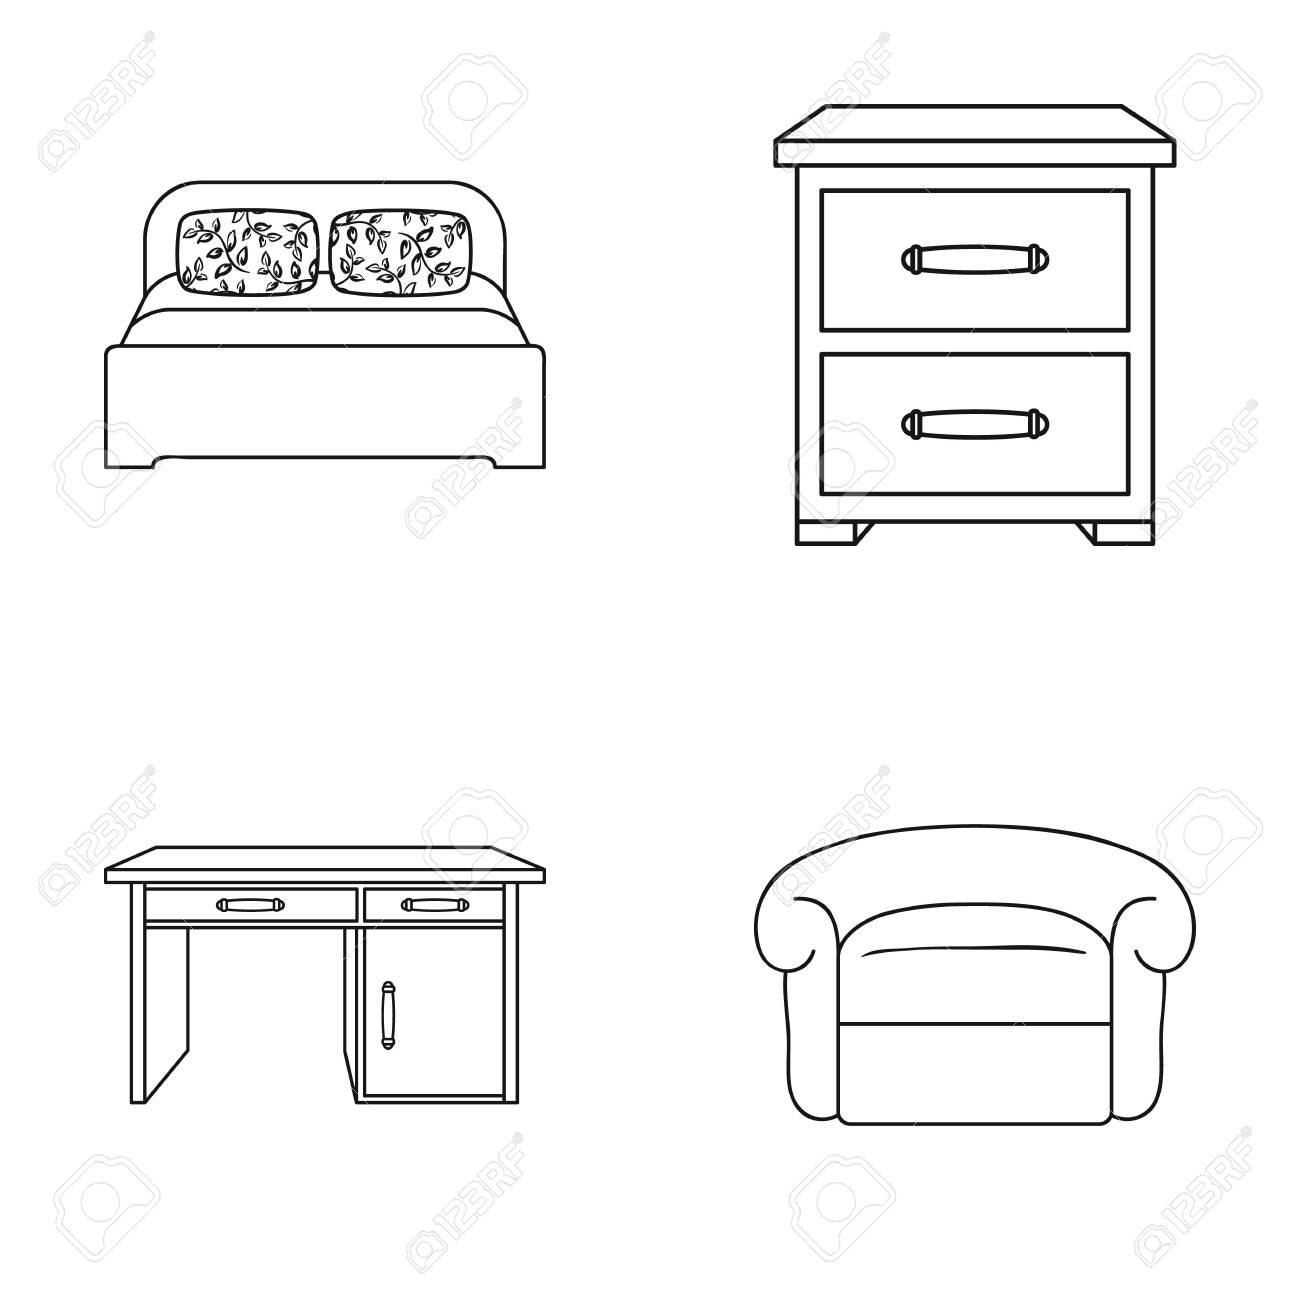 Interior Design Bed Bedroom Furniture And Home Interiorset